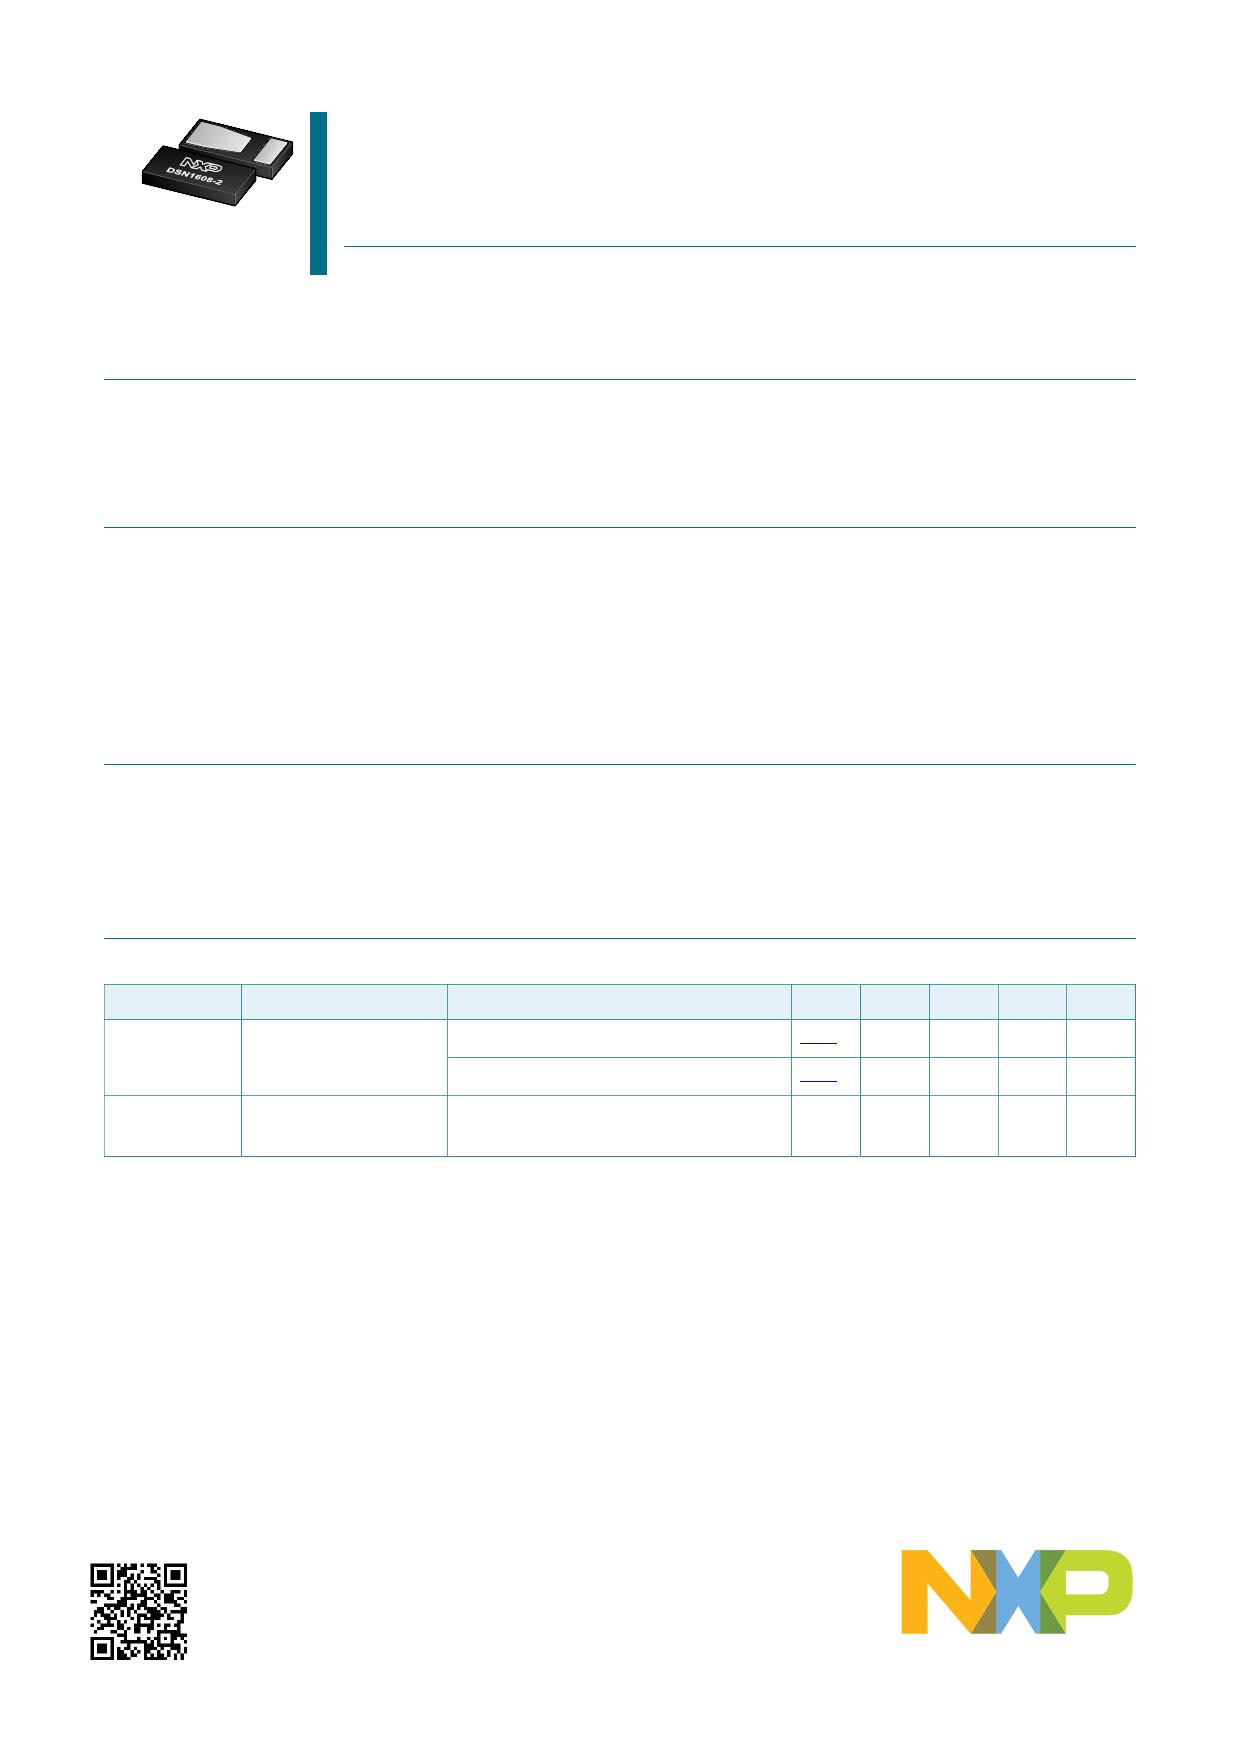 PTVS12VZ1USKN 데이터시트 및 PTVS12VZ1USKN PDF